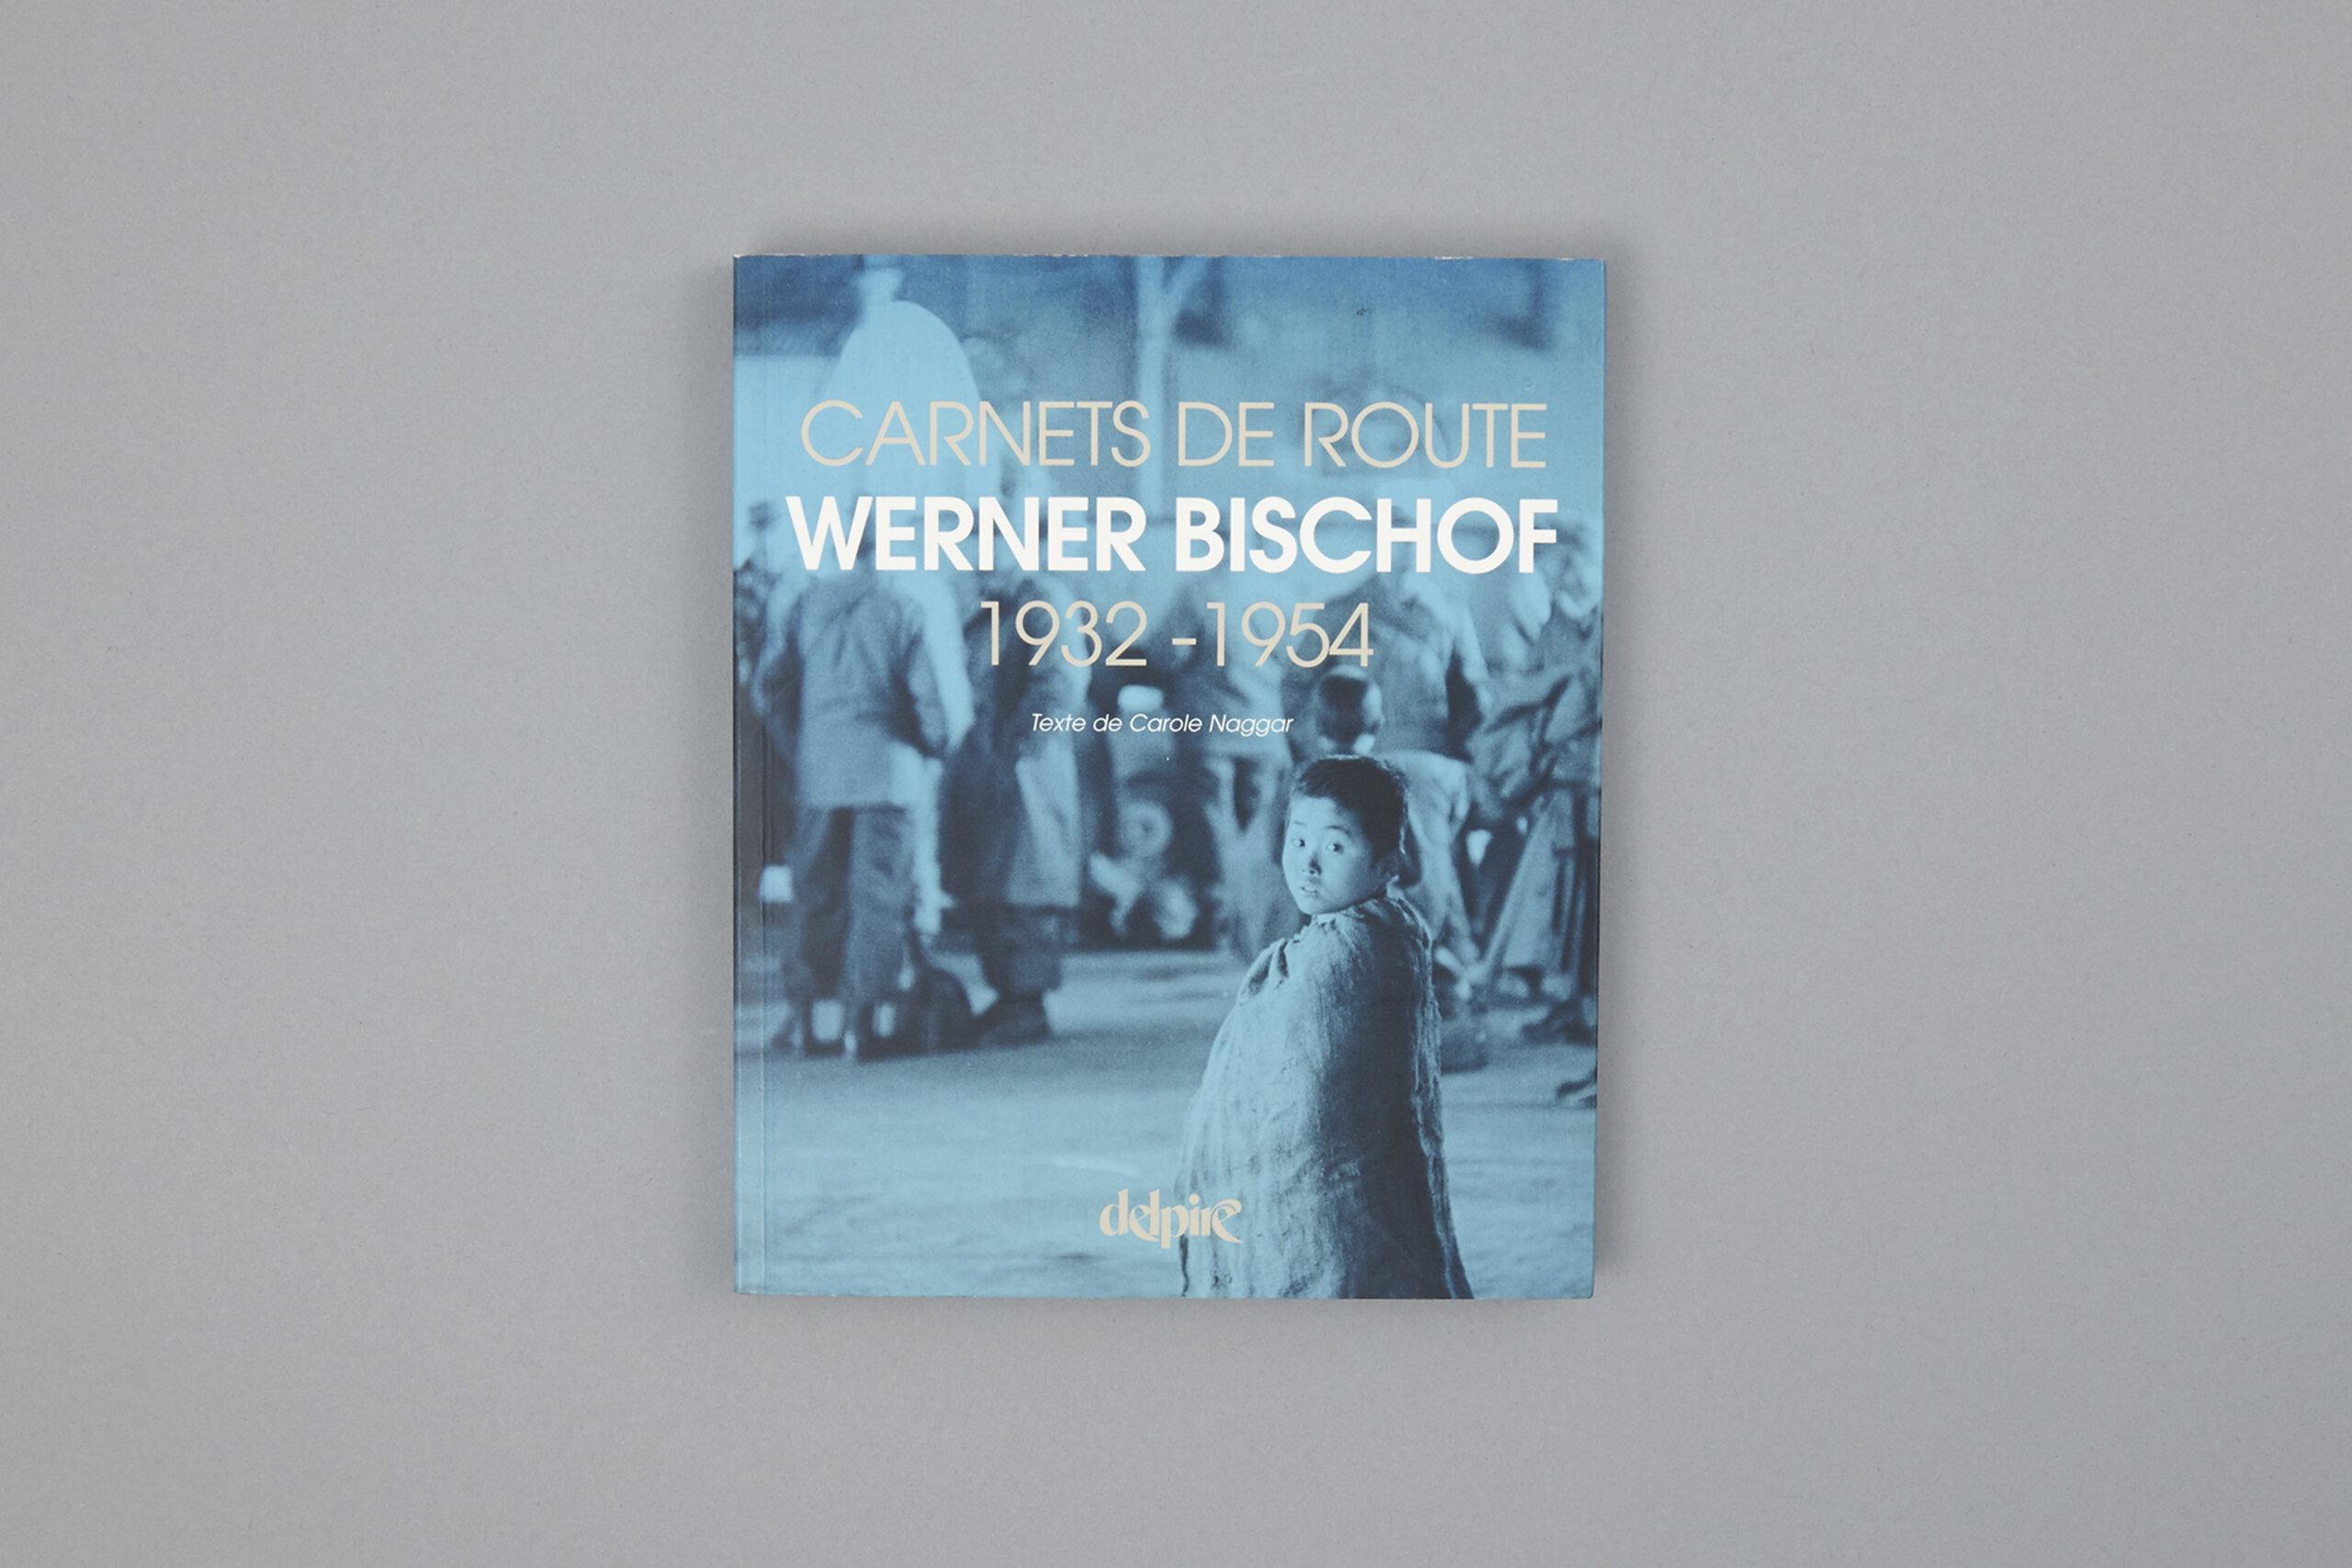 delpire-werner-bischof-carnets-de-route